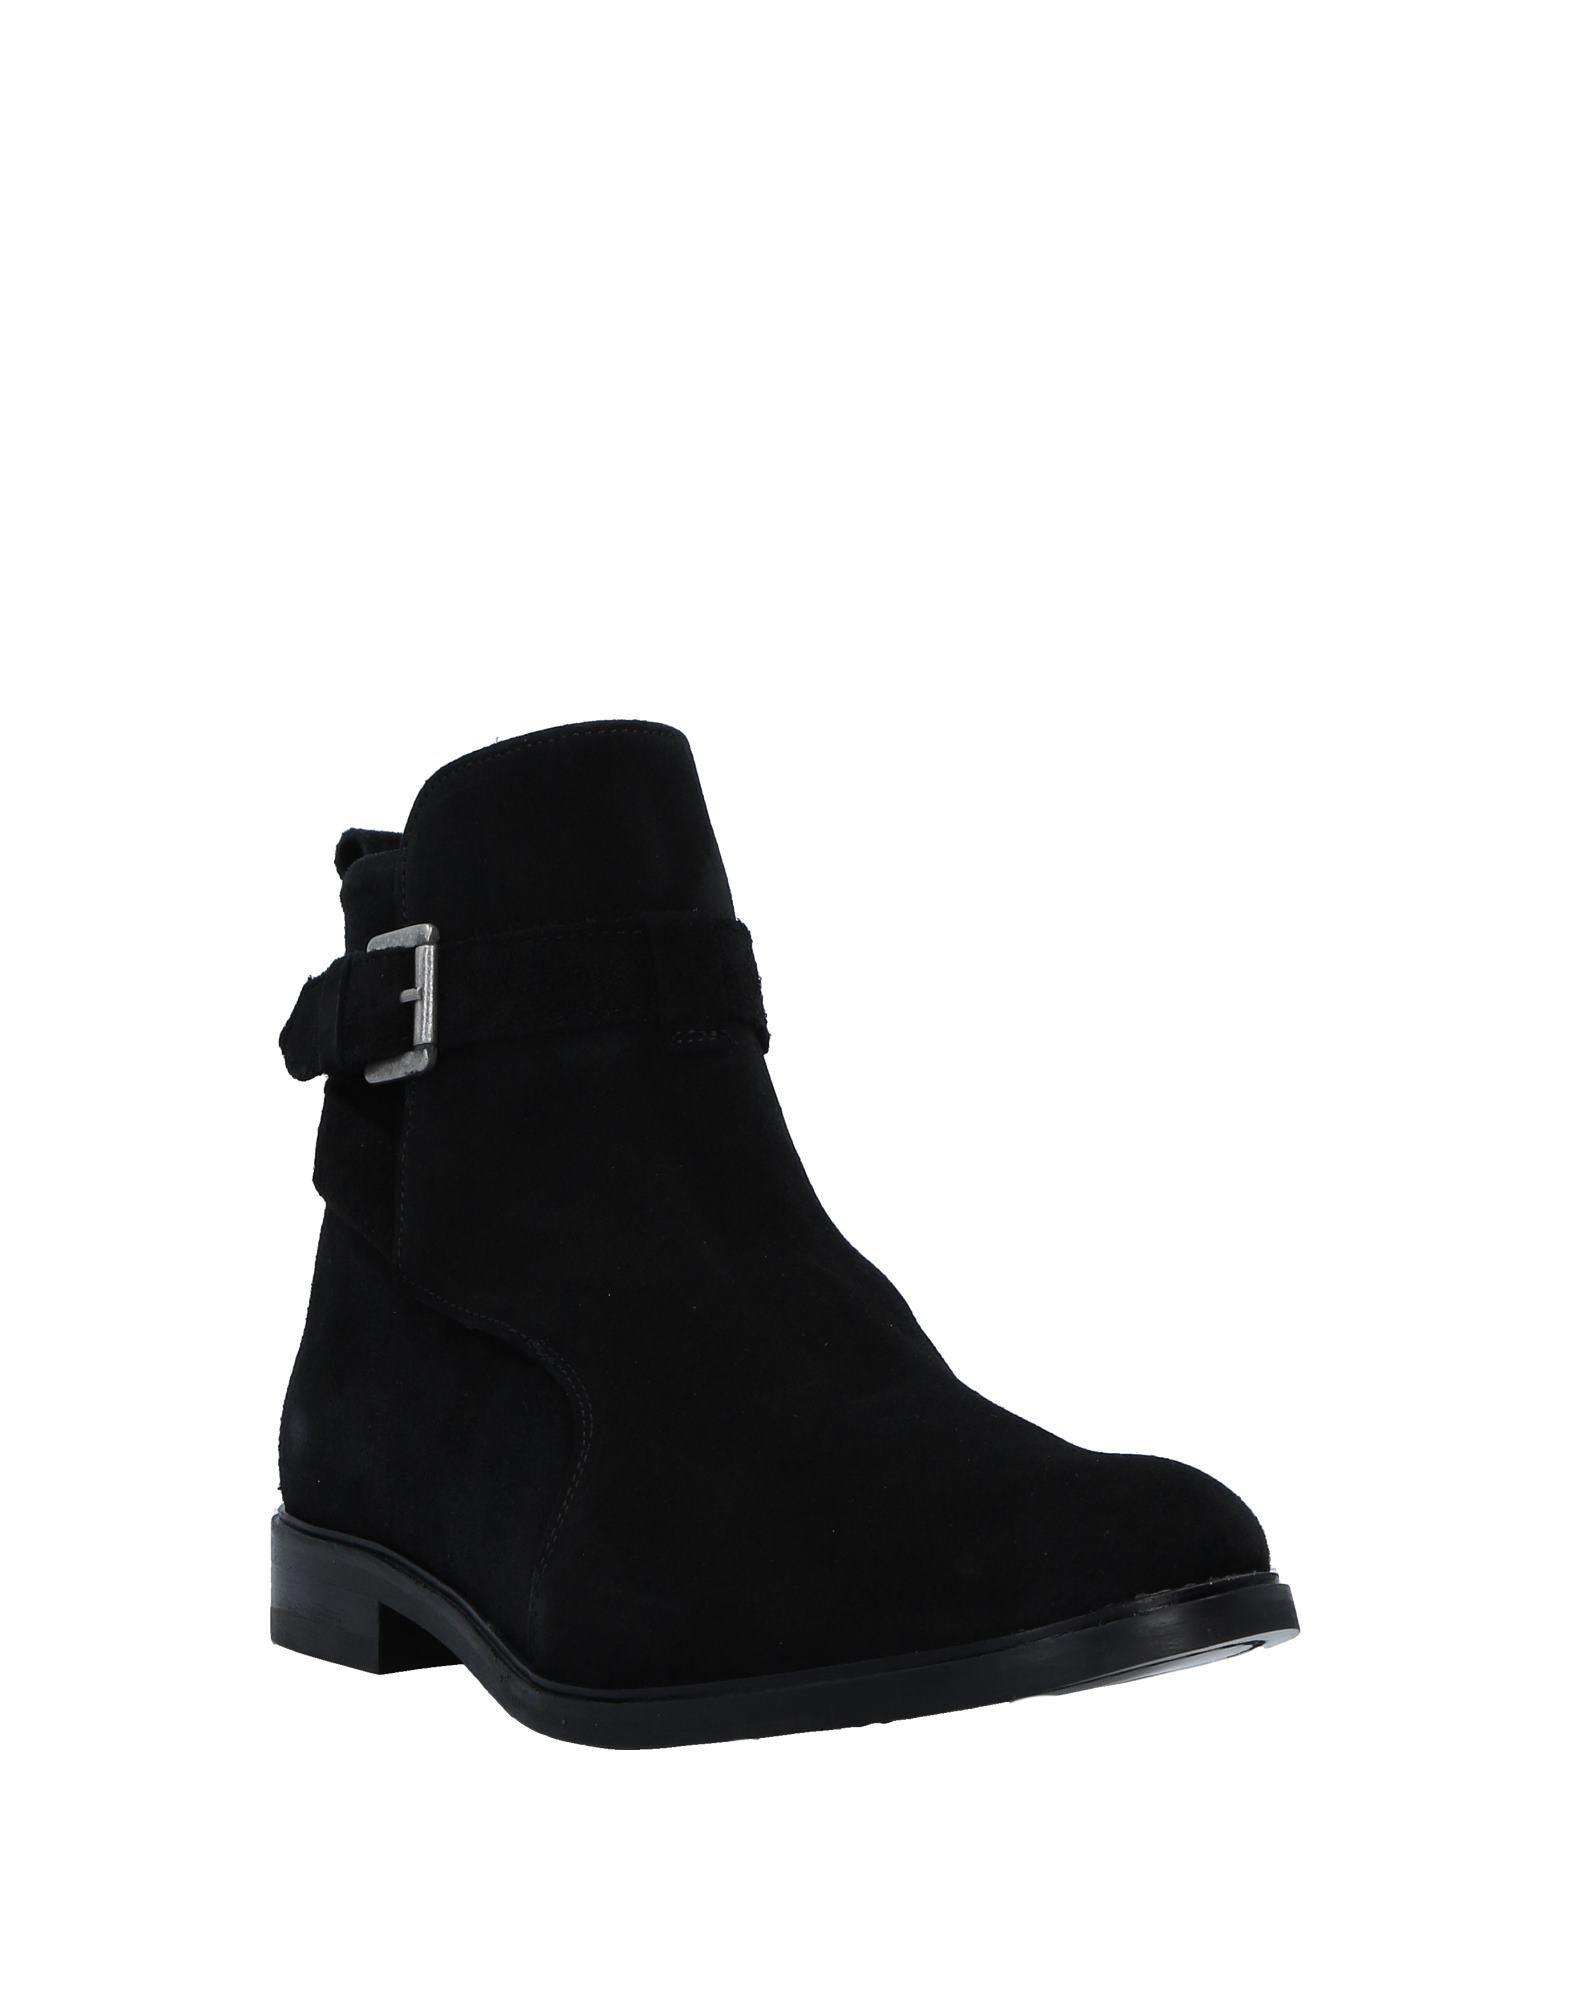 Royal Republiq Stiefelette Herren  Schuhe 11543383FU Gute Qualität beliebte Schuhe  206d48